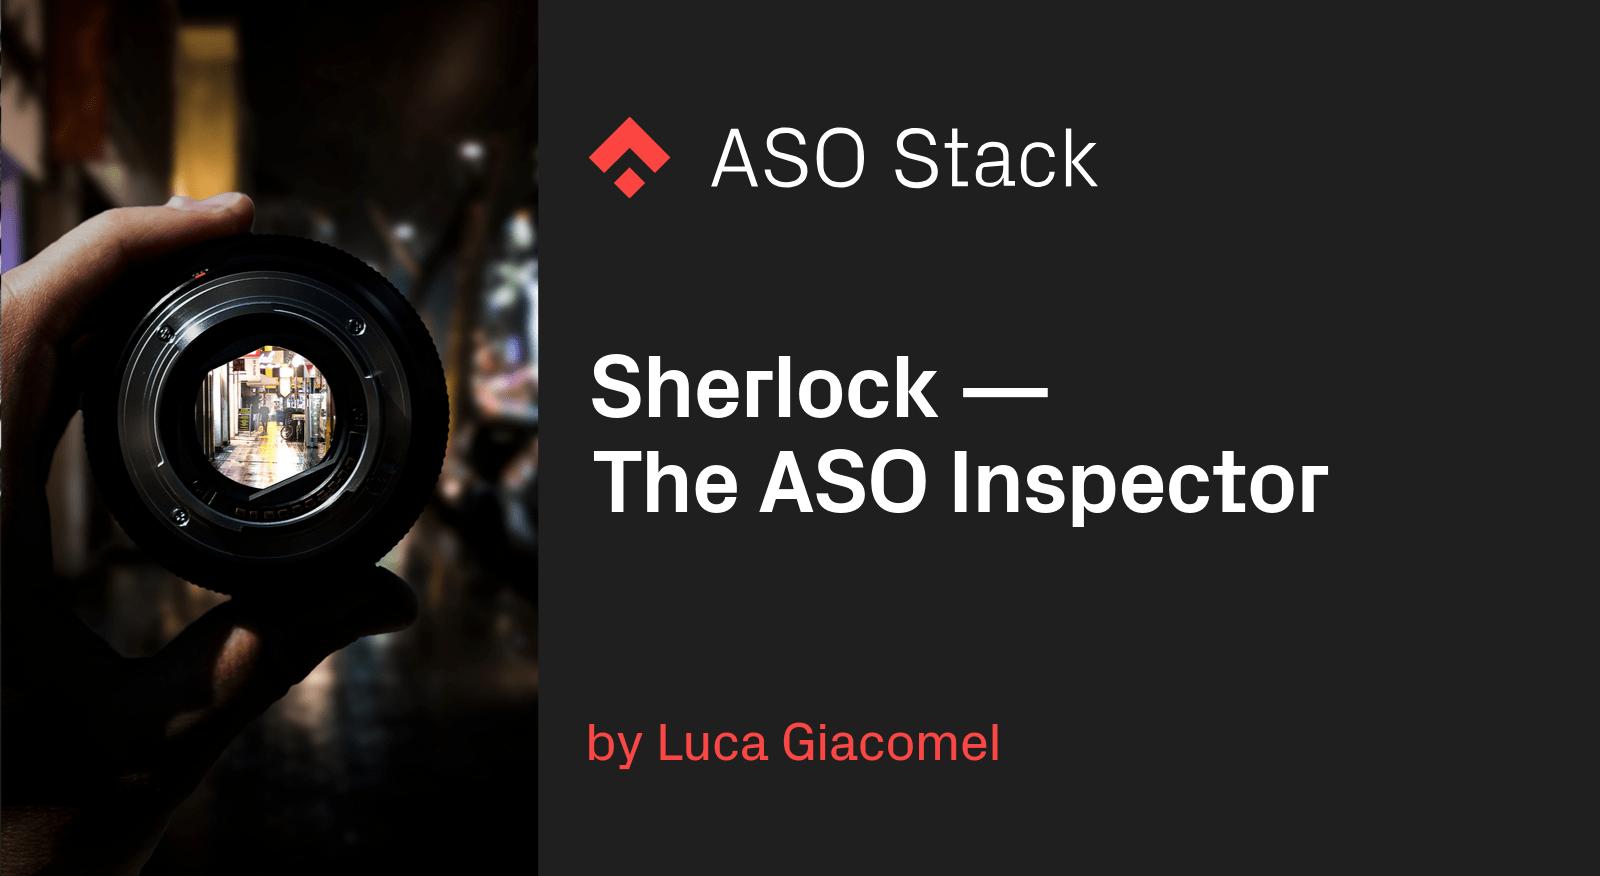 Sherlock 🕵️♂️ — The ASO Inspector